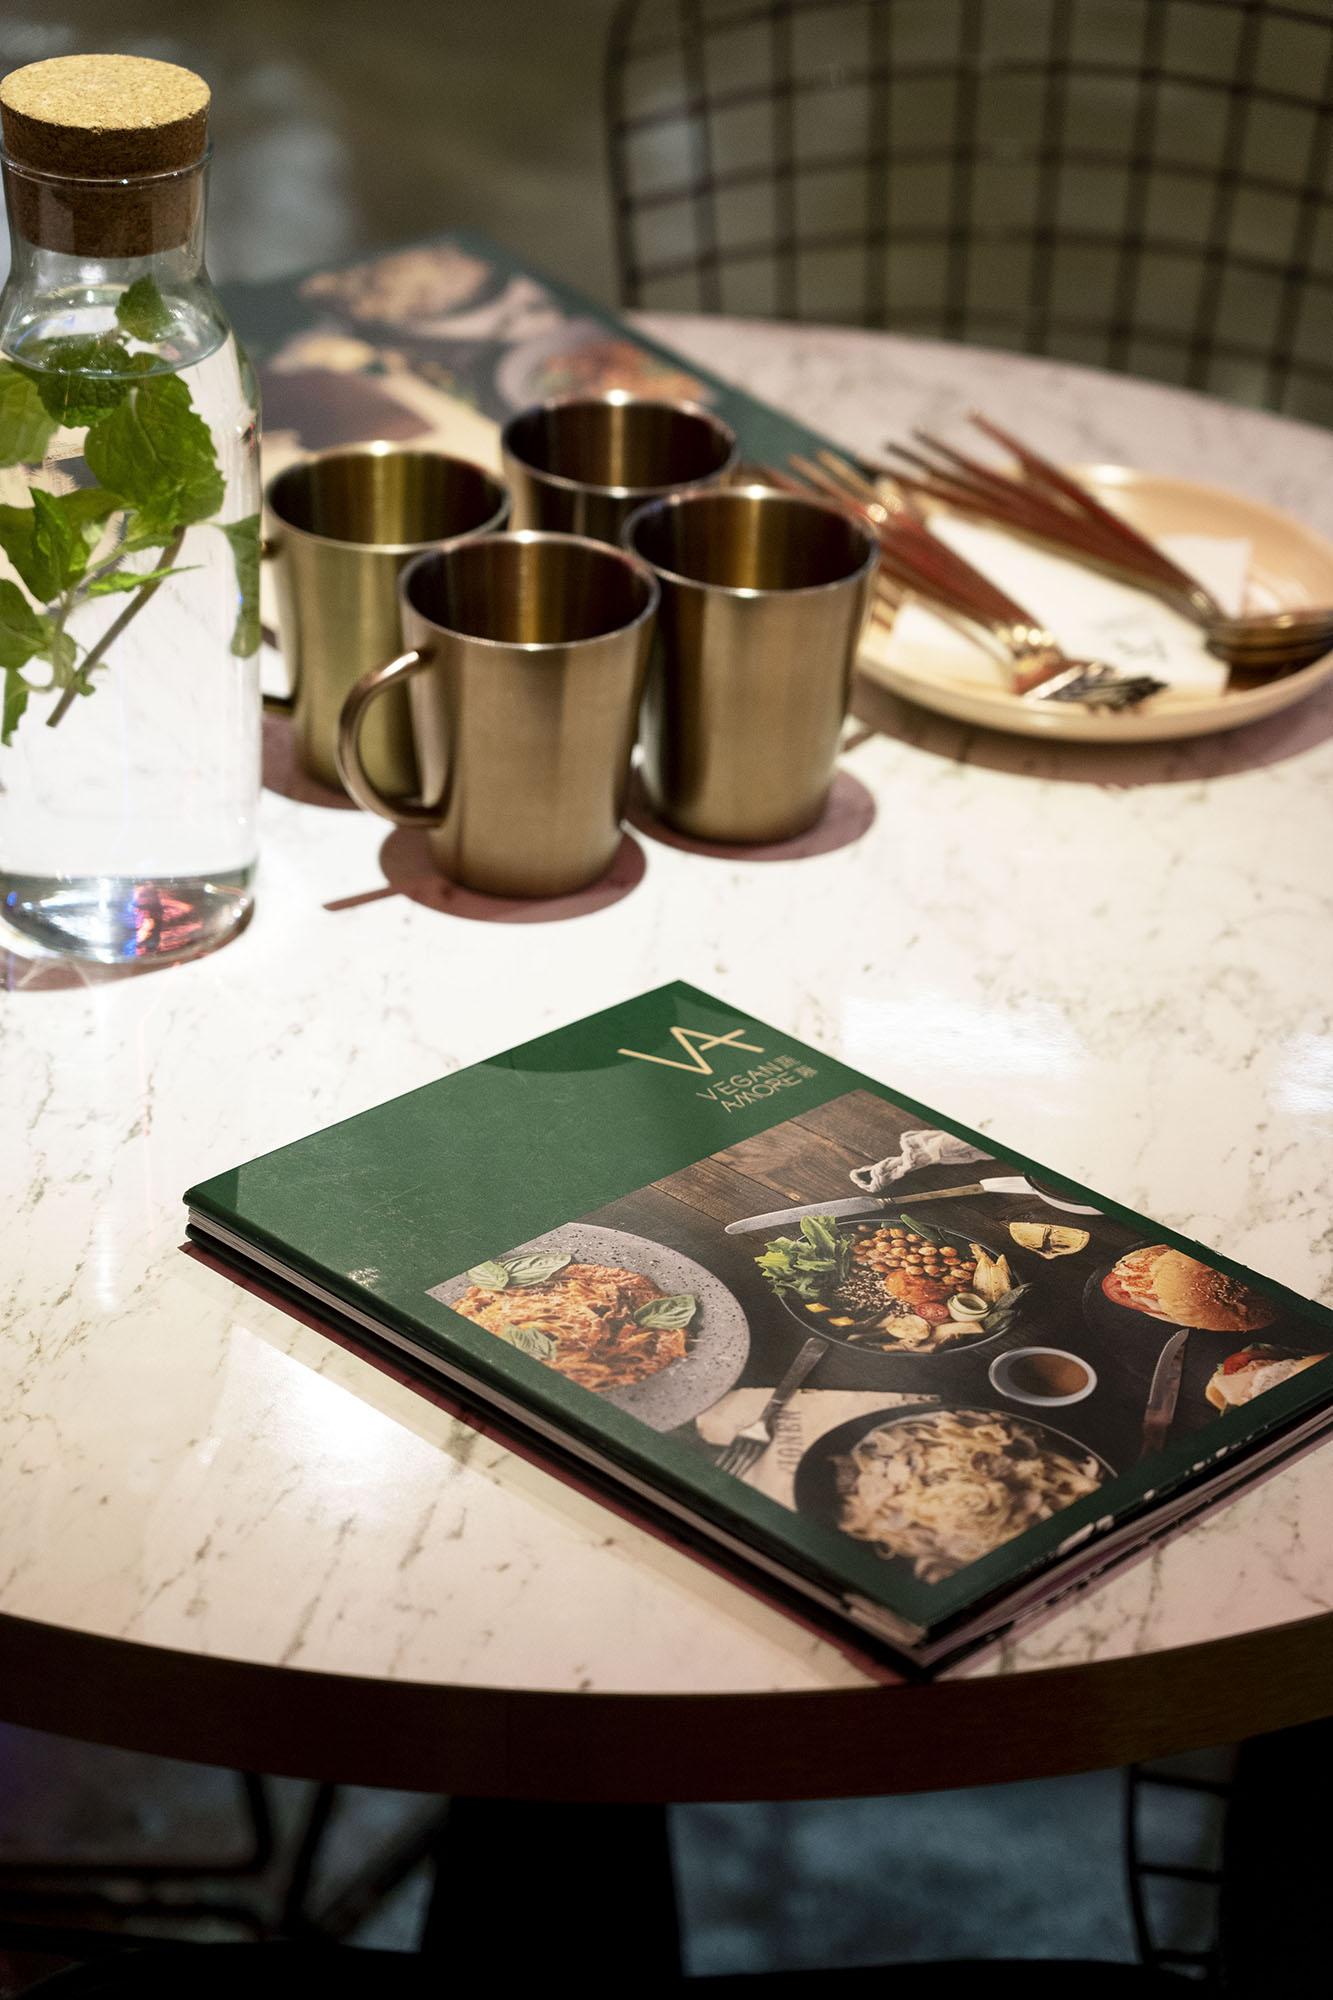 Vegan Amore 蔬慕|台北蔬食西式餐酒館,春季裡的兒時大人味